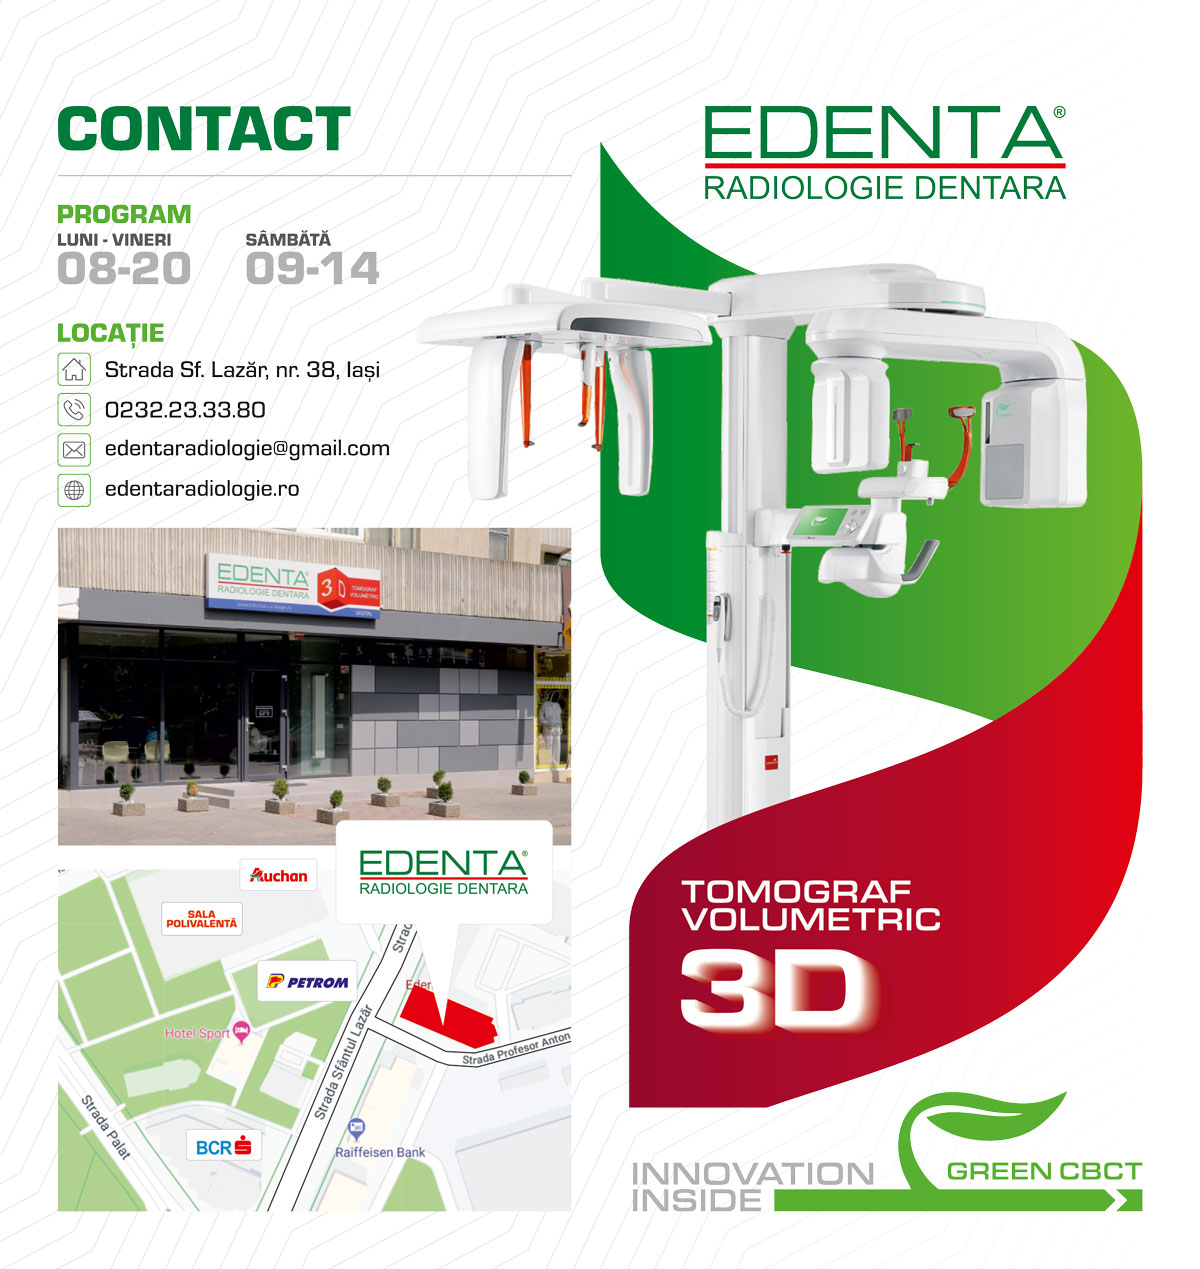 Edenta-PLN-12-2018-VIZUALIZARE-72dpi-1